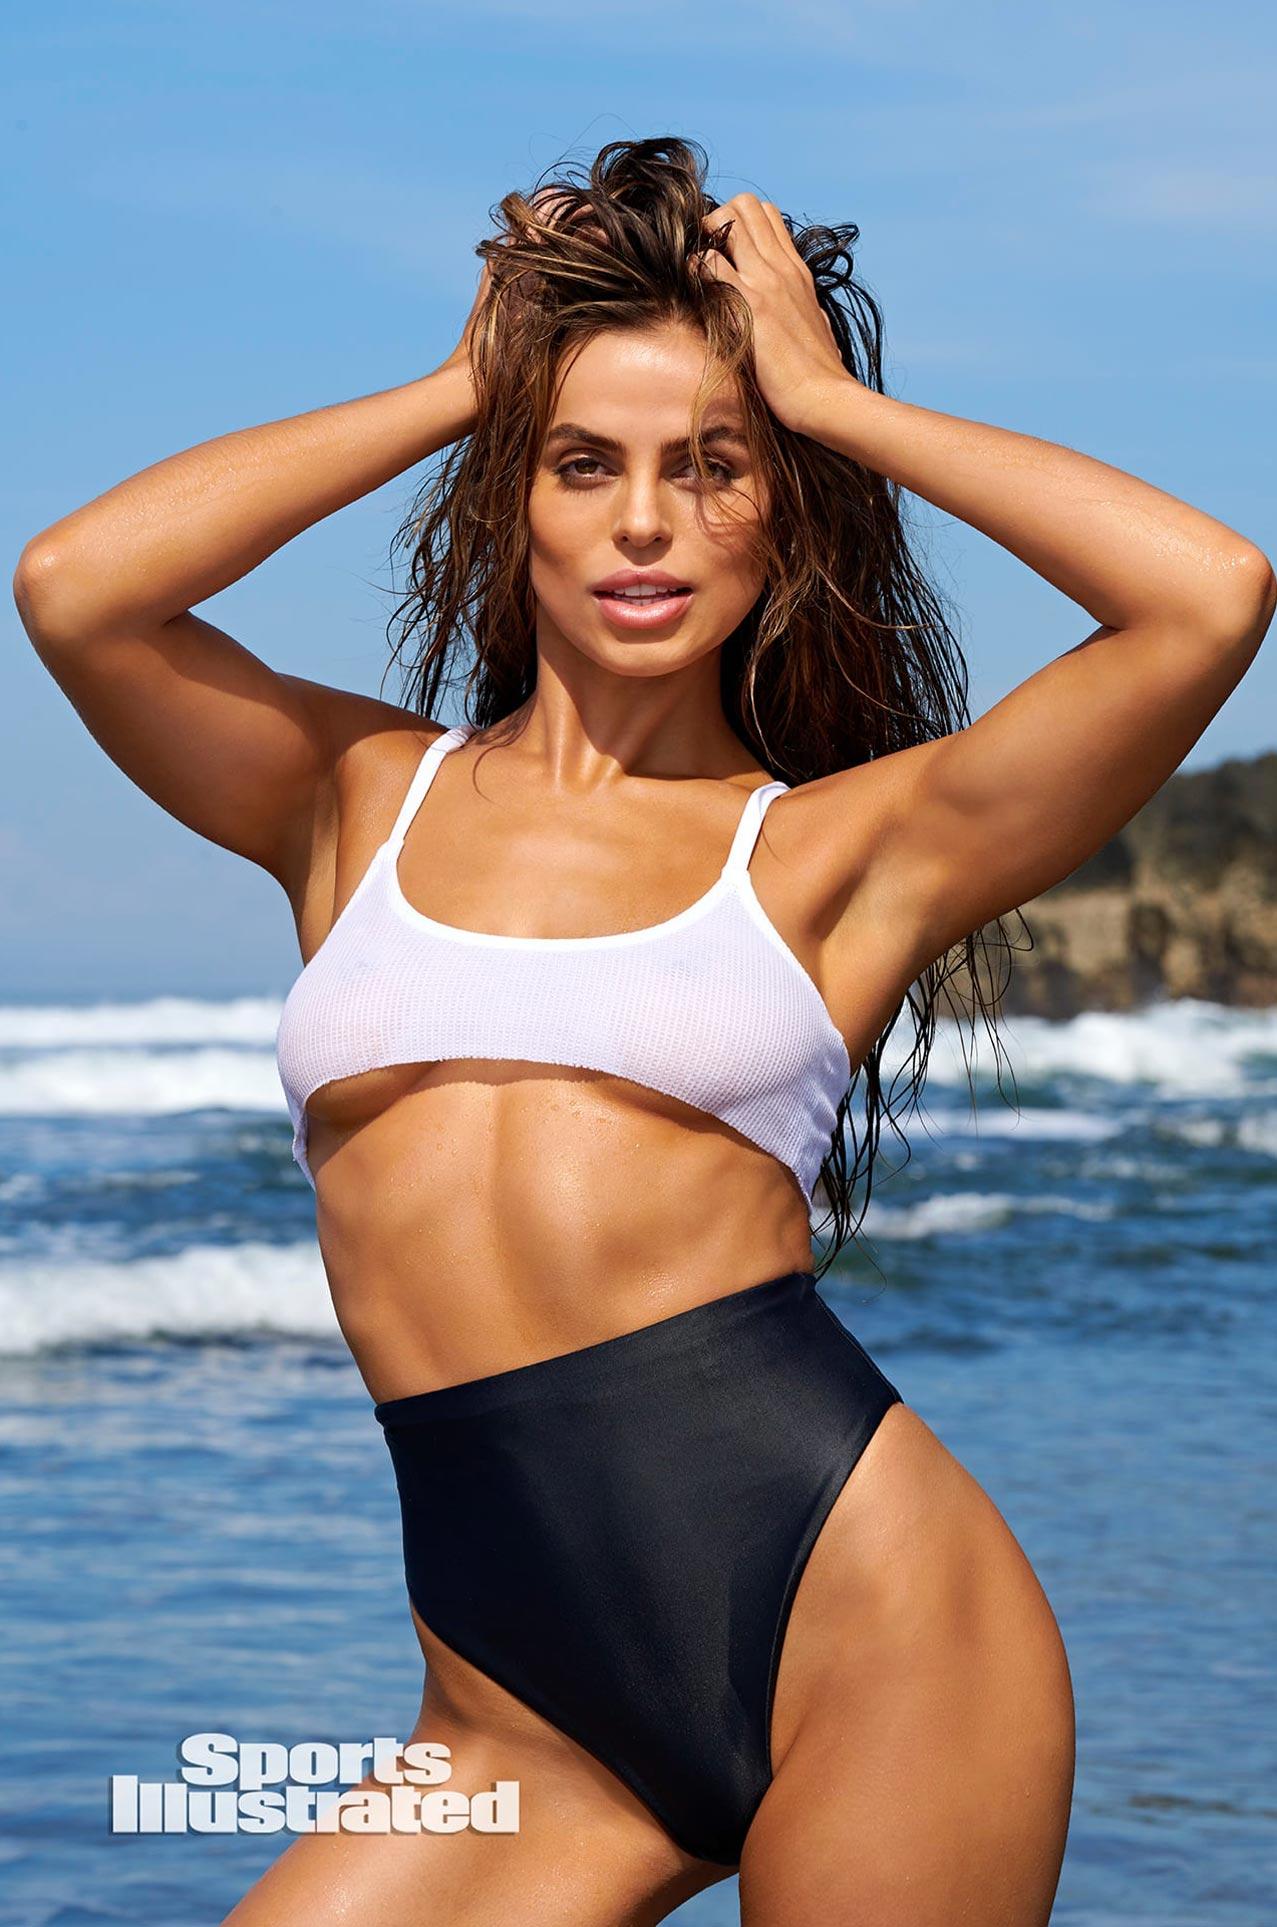 Брукс Надер в каталоге купальников Sports Illustrated Swimsuit 2020 / фото 08